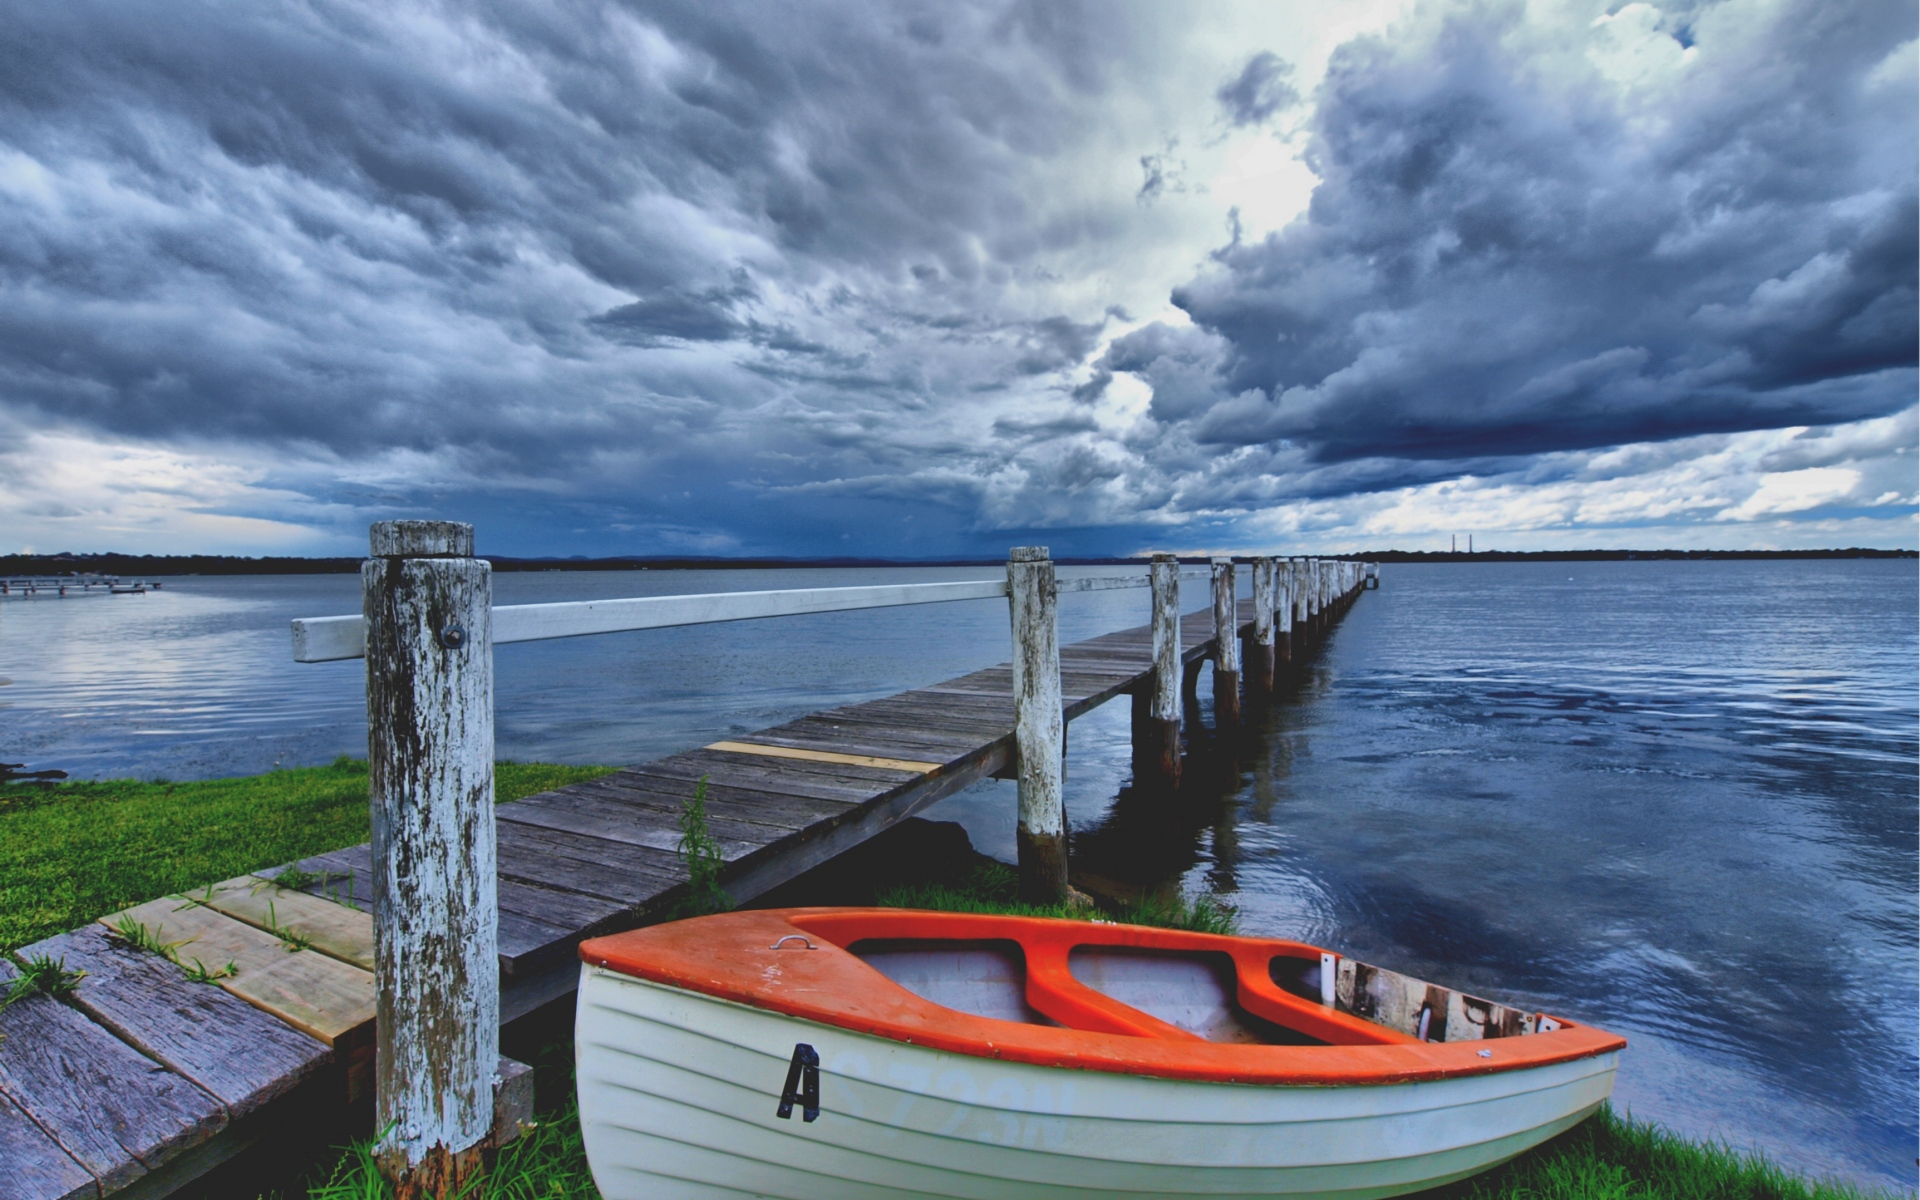 Картинки Лодка, пристань, побережье, водохранилище, облачно, вечер фото и обои на рабочий стол